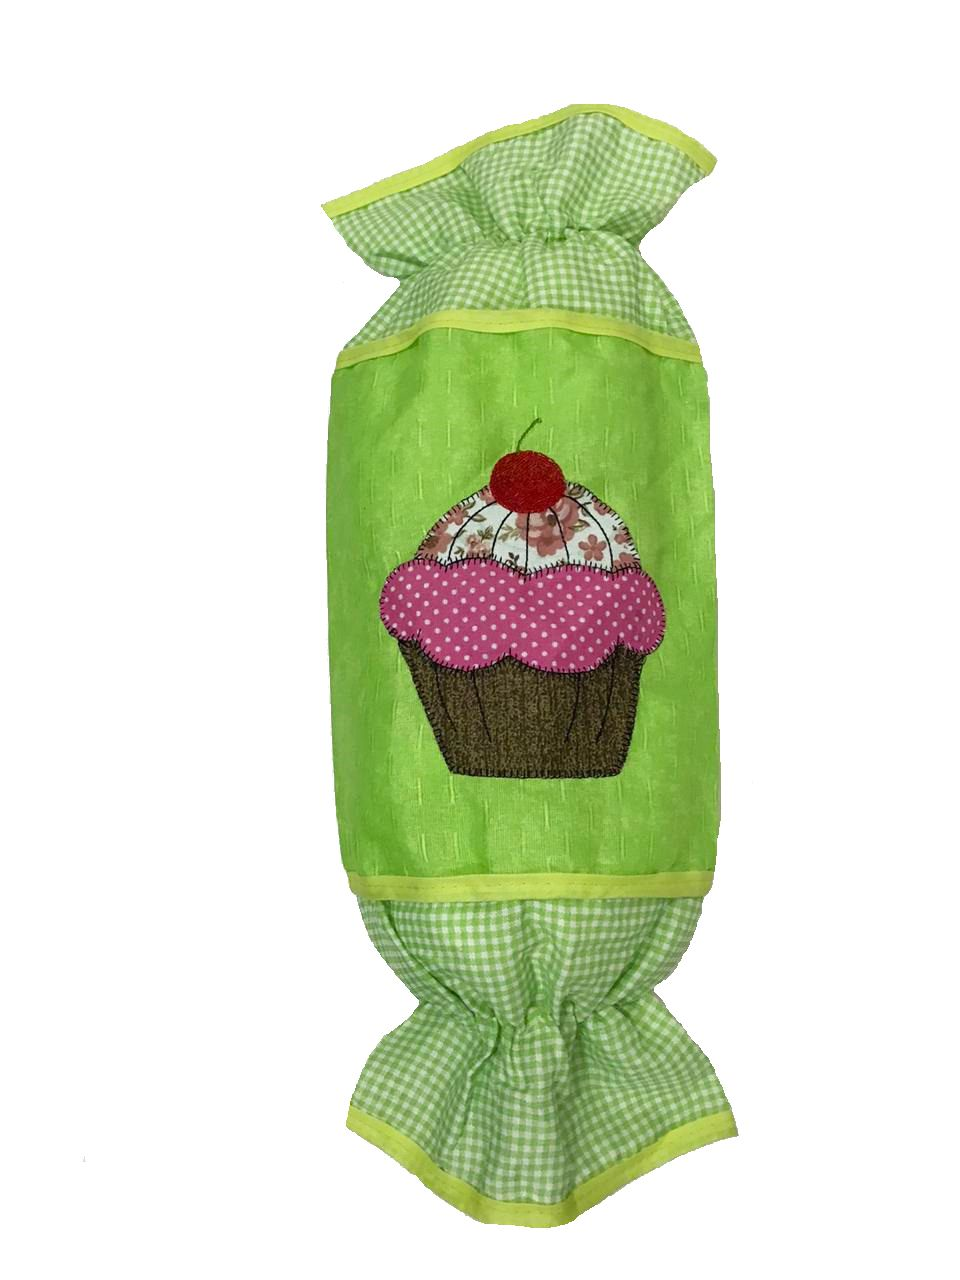 Puxa Saco Patchwork - Cupcake